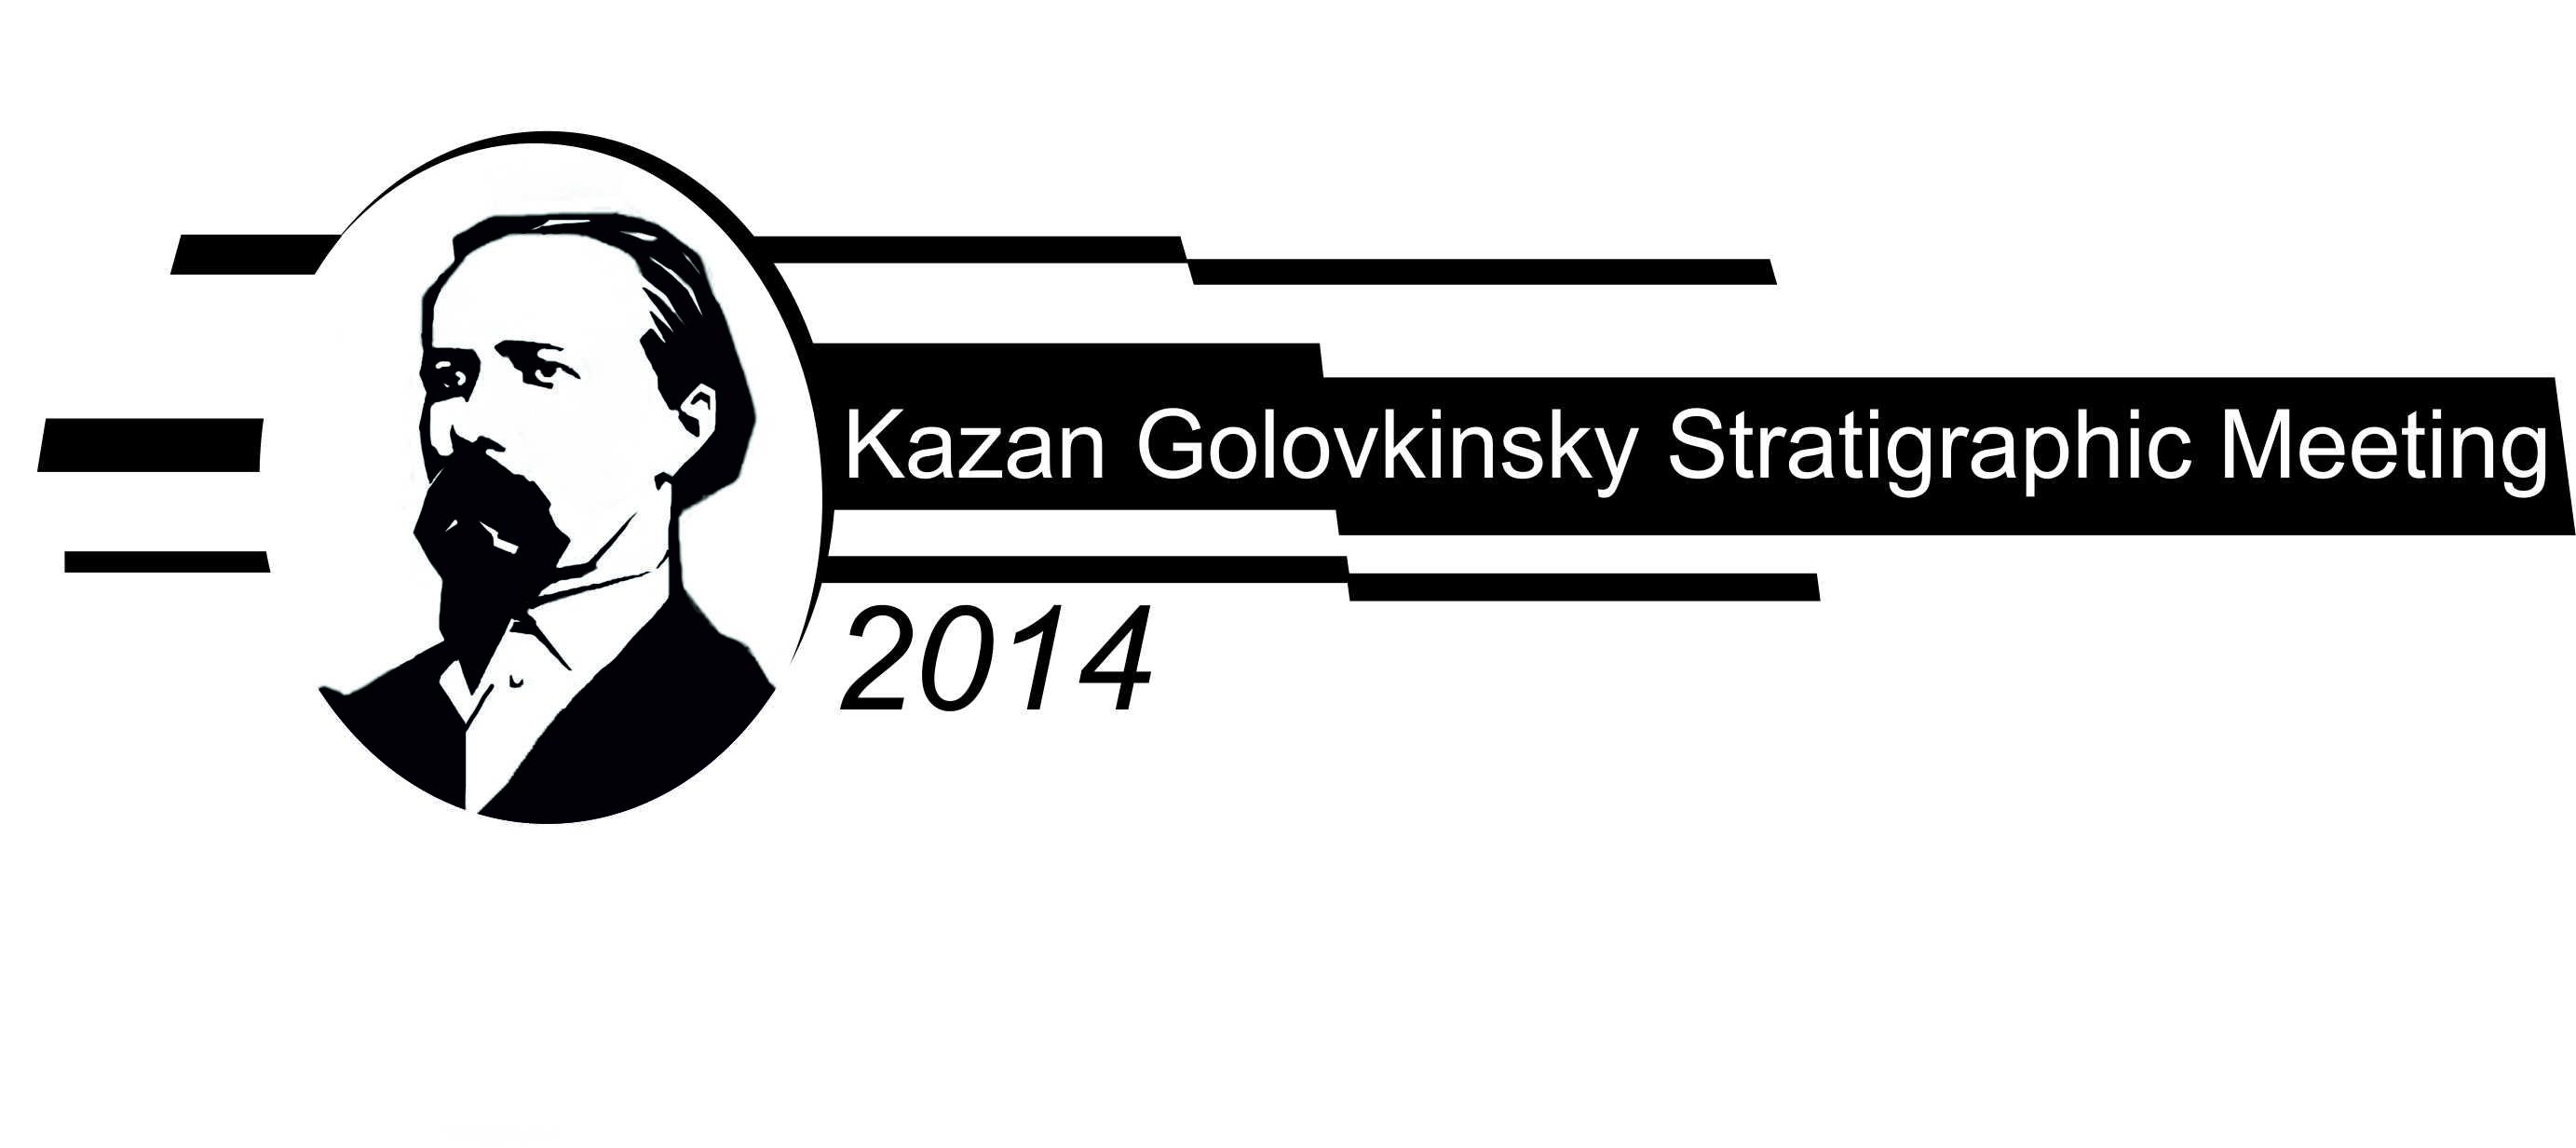 ПОРТАЛ КФУ \ Academic Units \ Natural Sciences \ Institute of Geology and Petroleum Technologies \ Kazan Golovkinsky Stratigraphic Meeting \ About Nikolay A. Golovkinsky